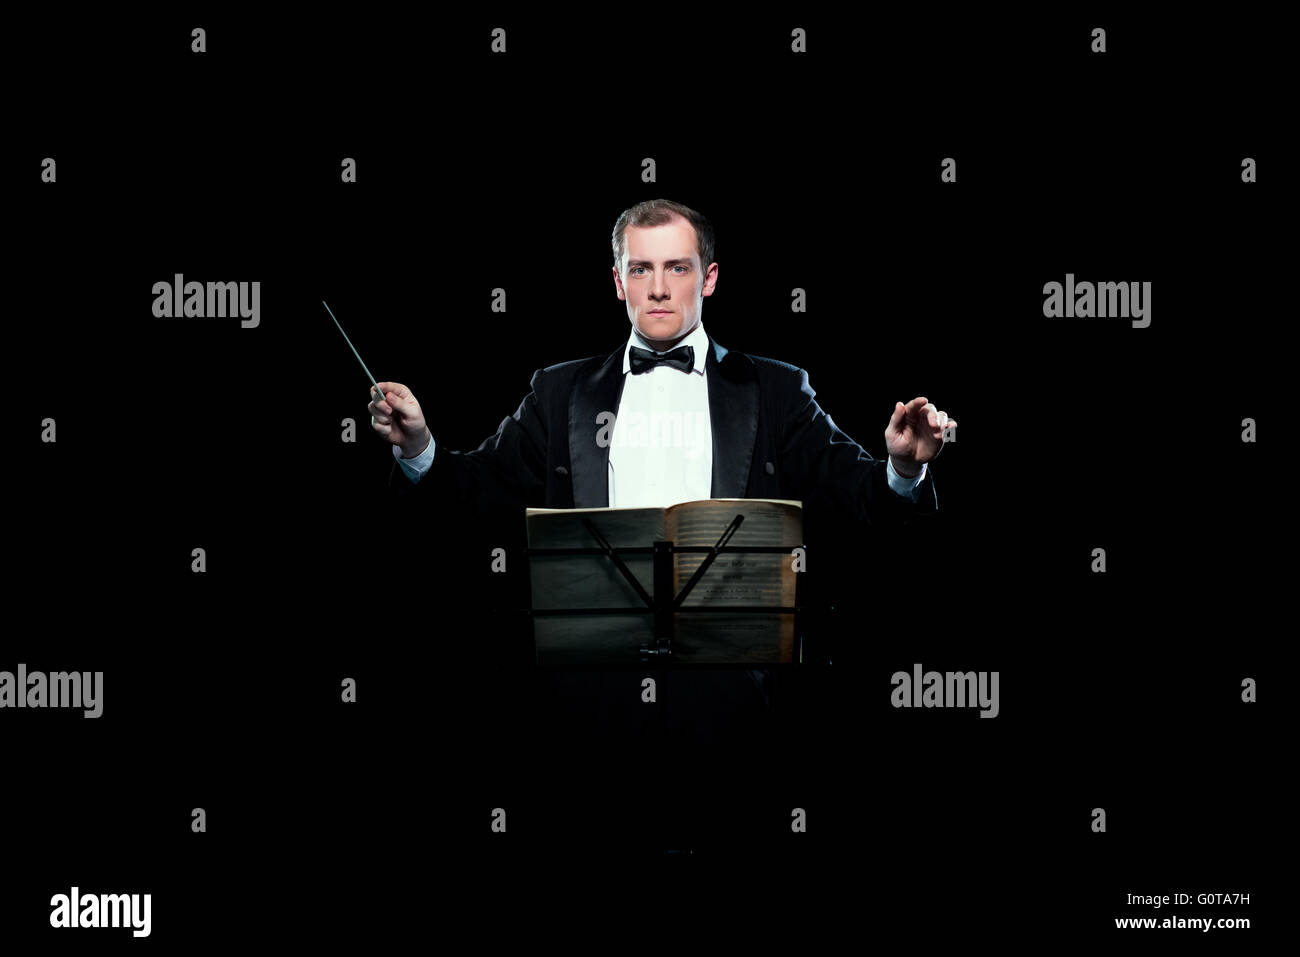 Studio photo of music conductor holding his baton - Stock Image